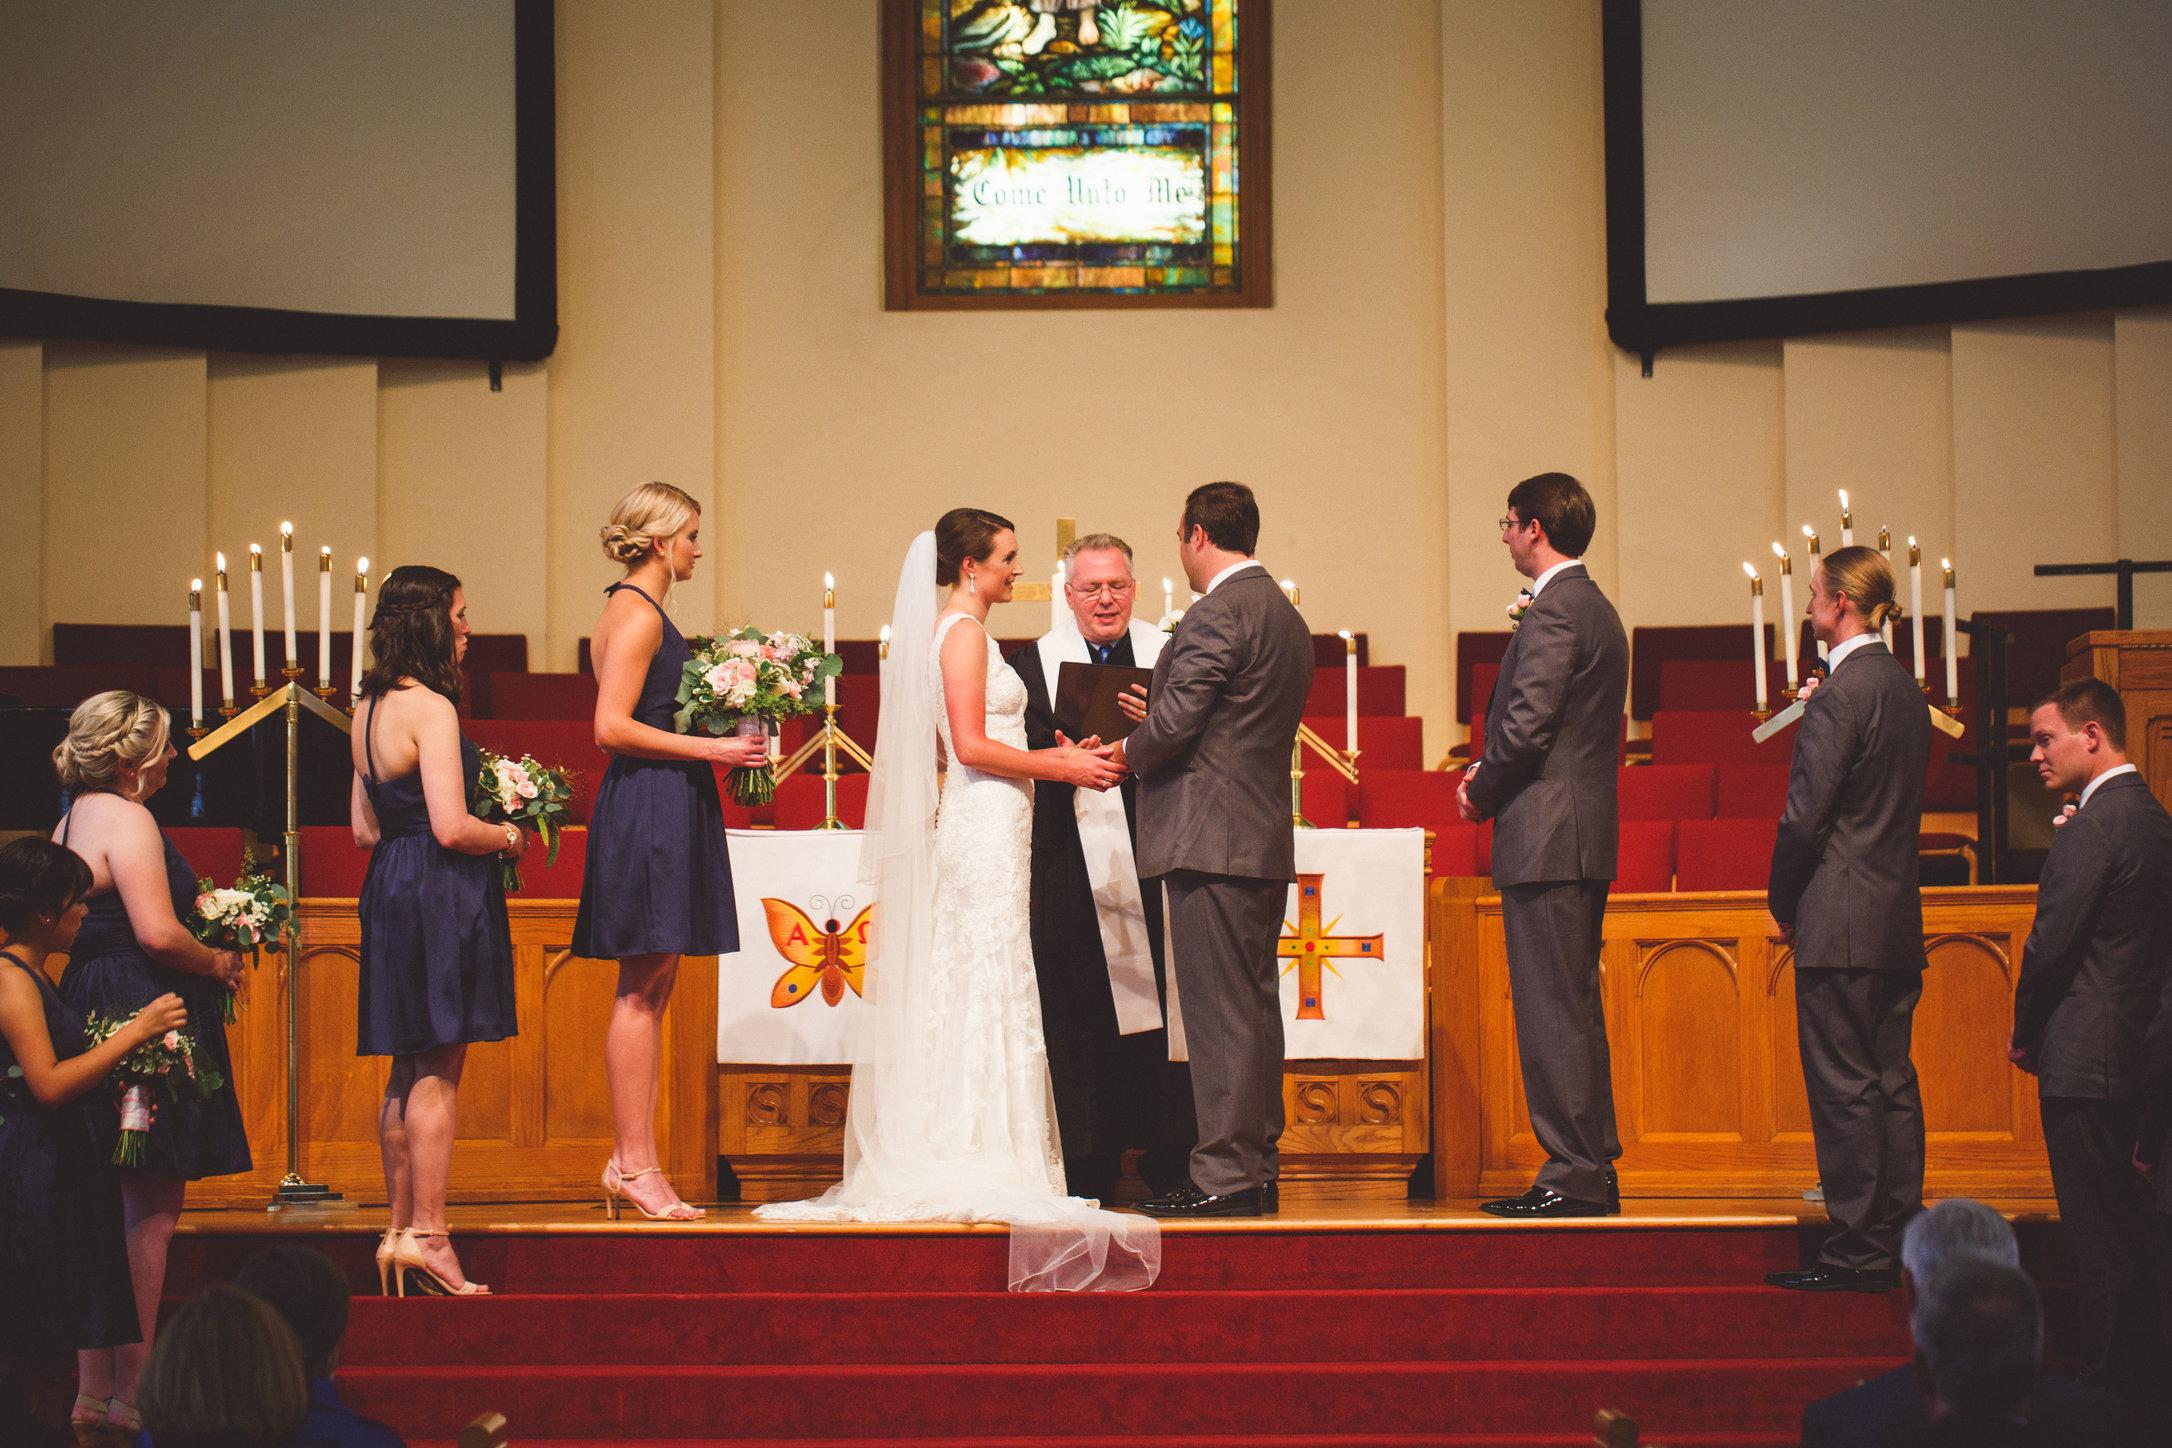 SandC-wedding-212.jpg